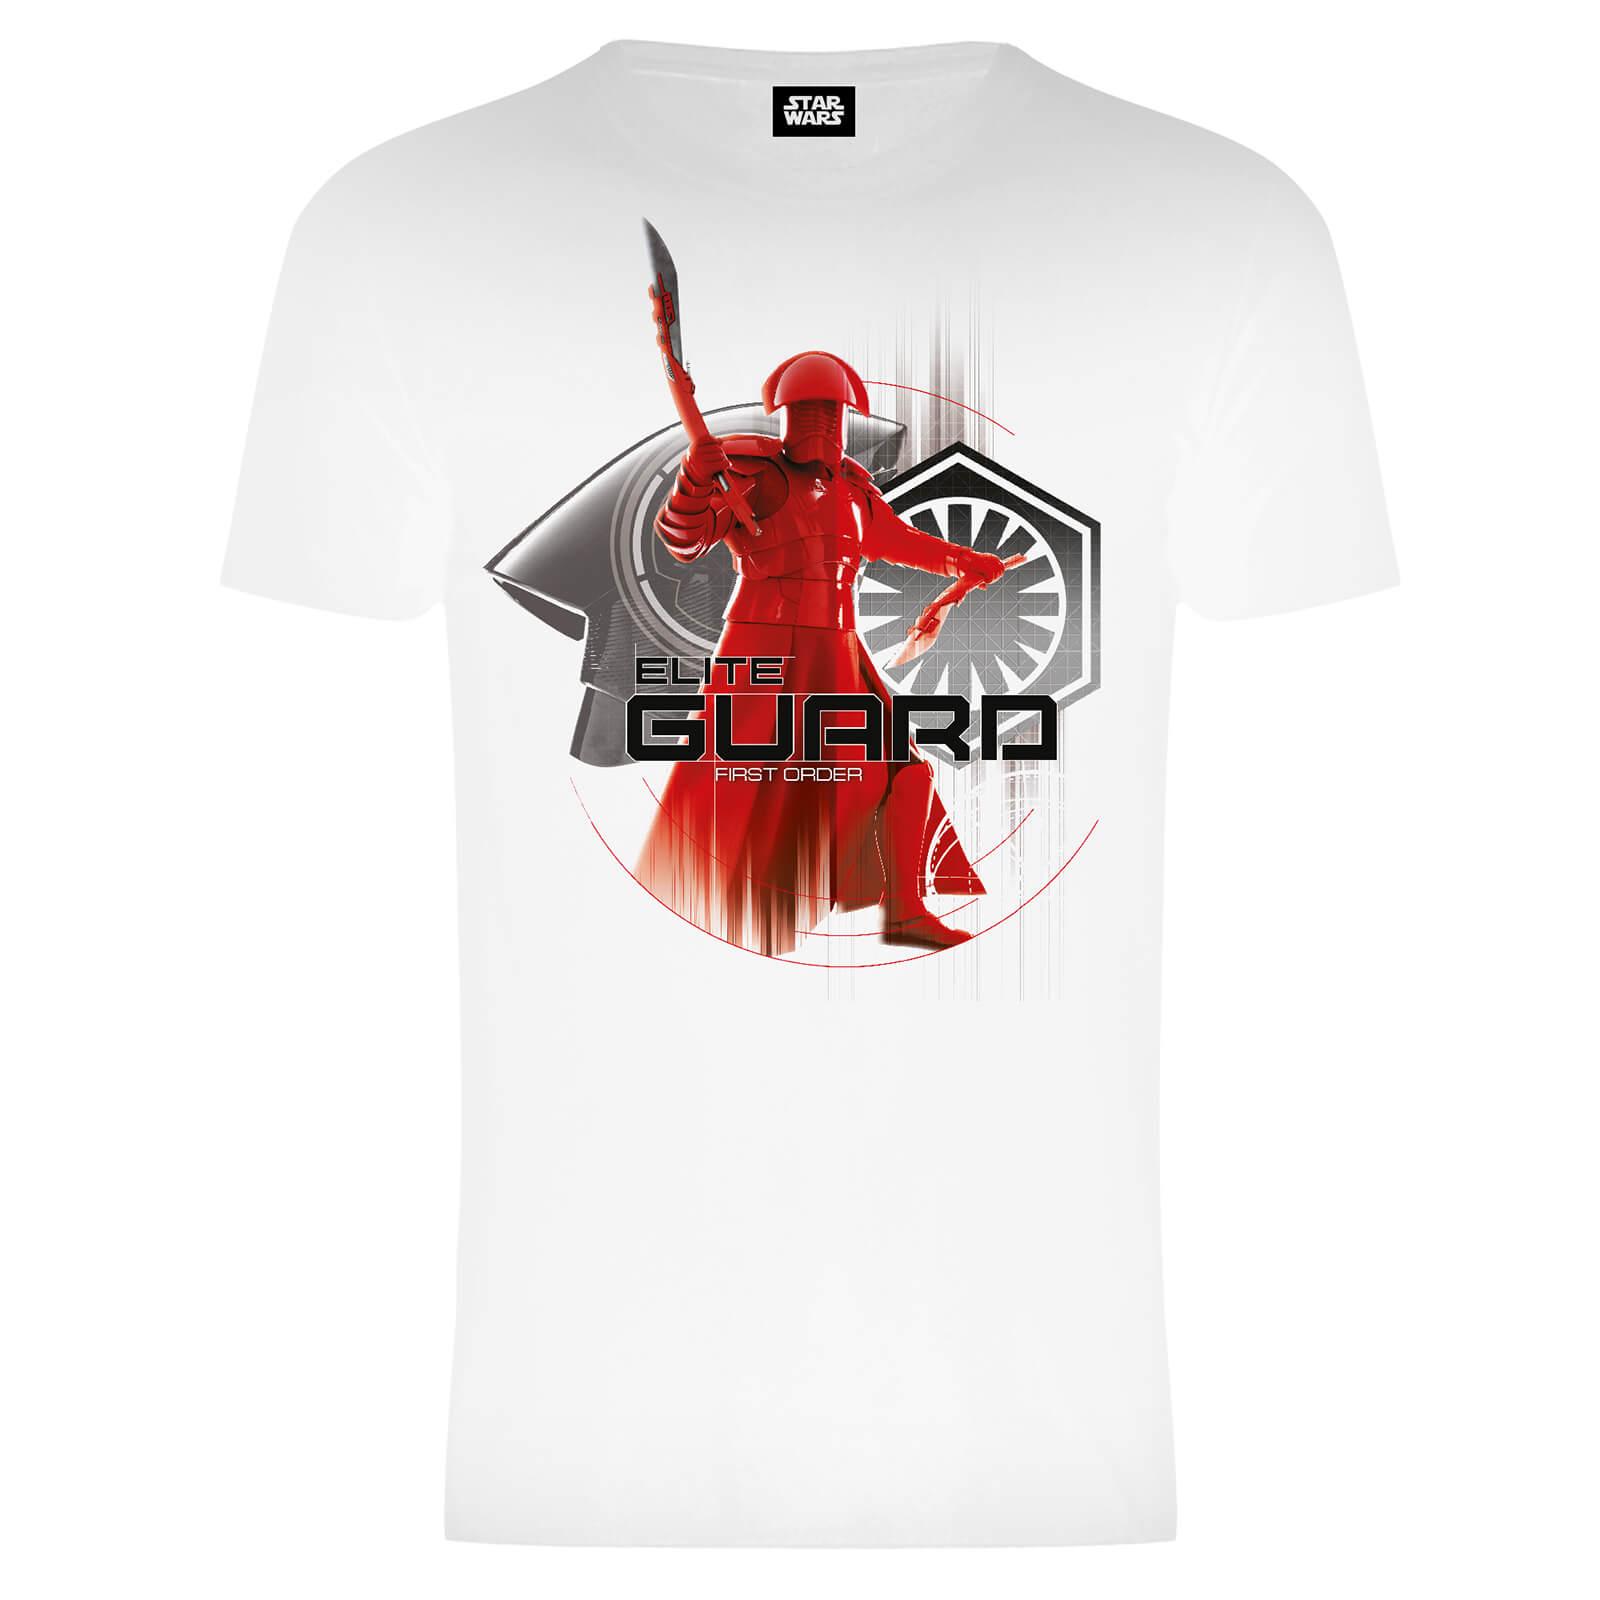 Geek Clothing Star Wars Men's The Last Jedi Elite Guard T-Shirt - White - XXL - White